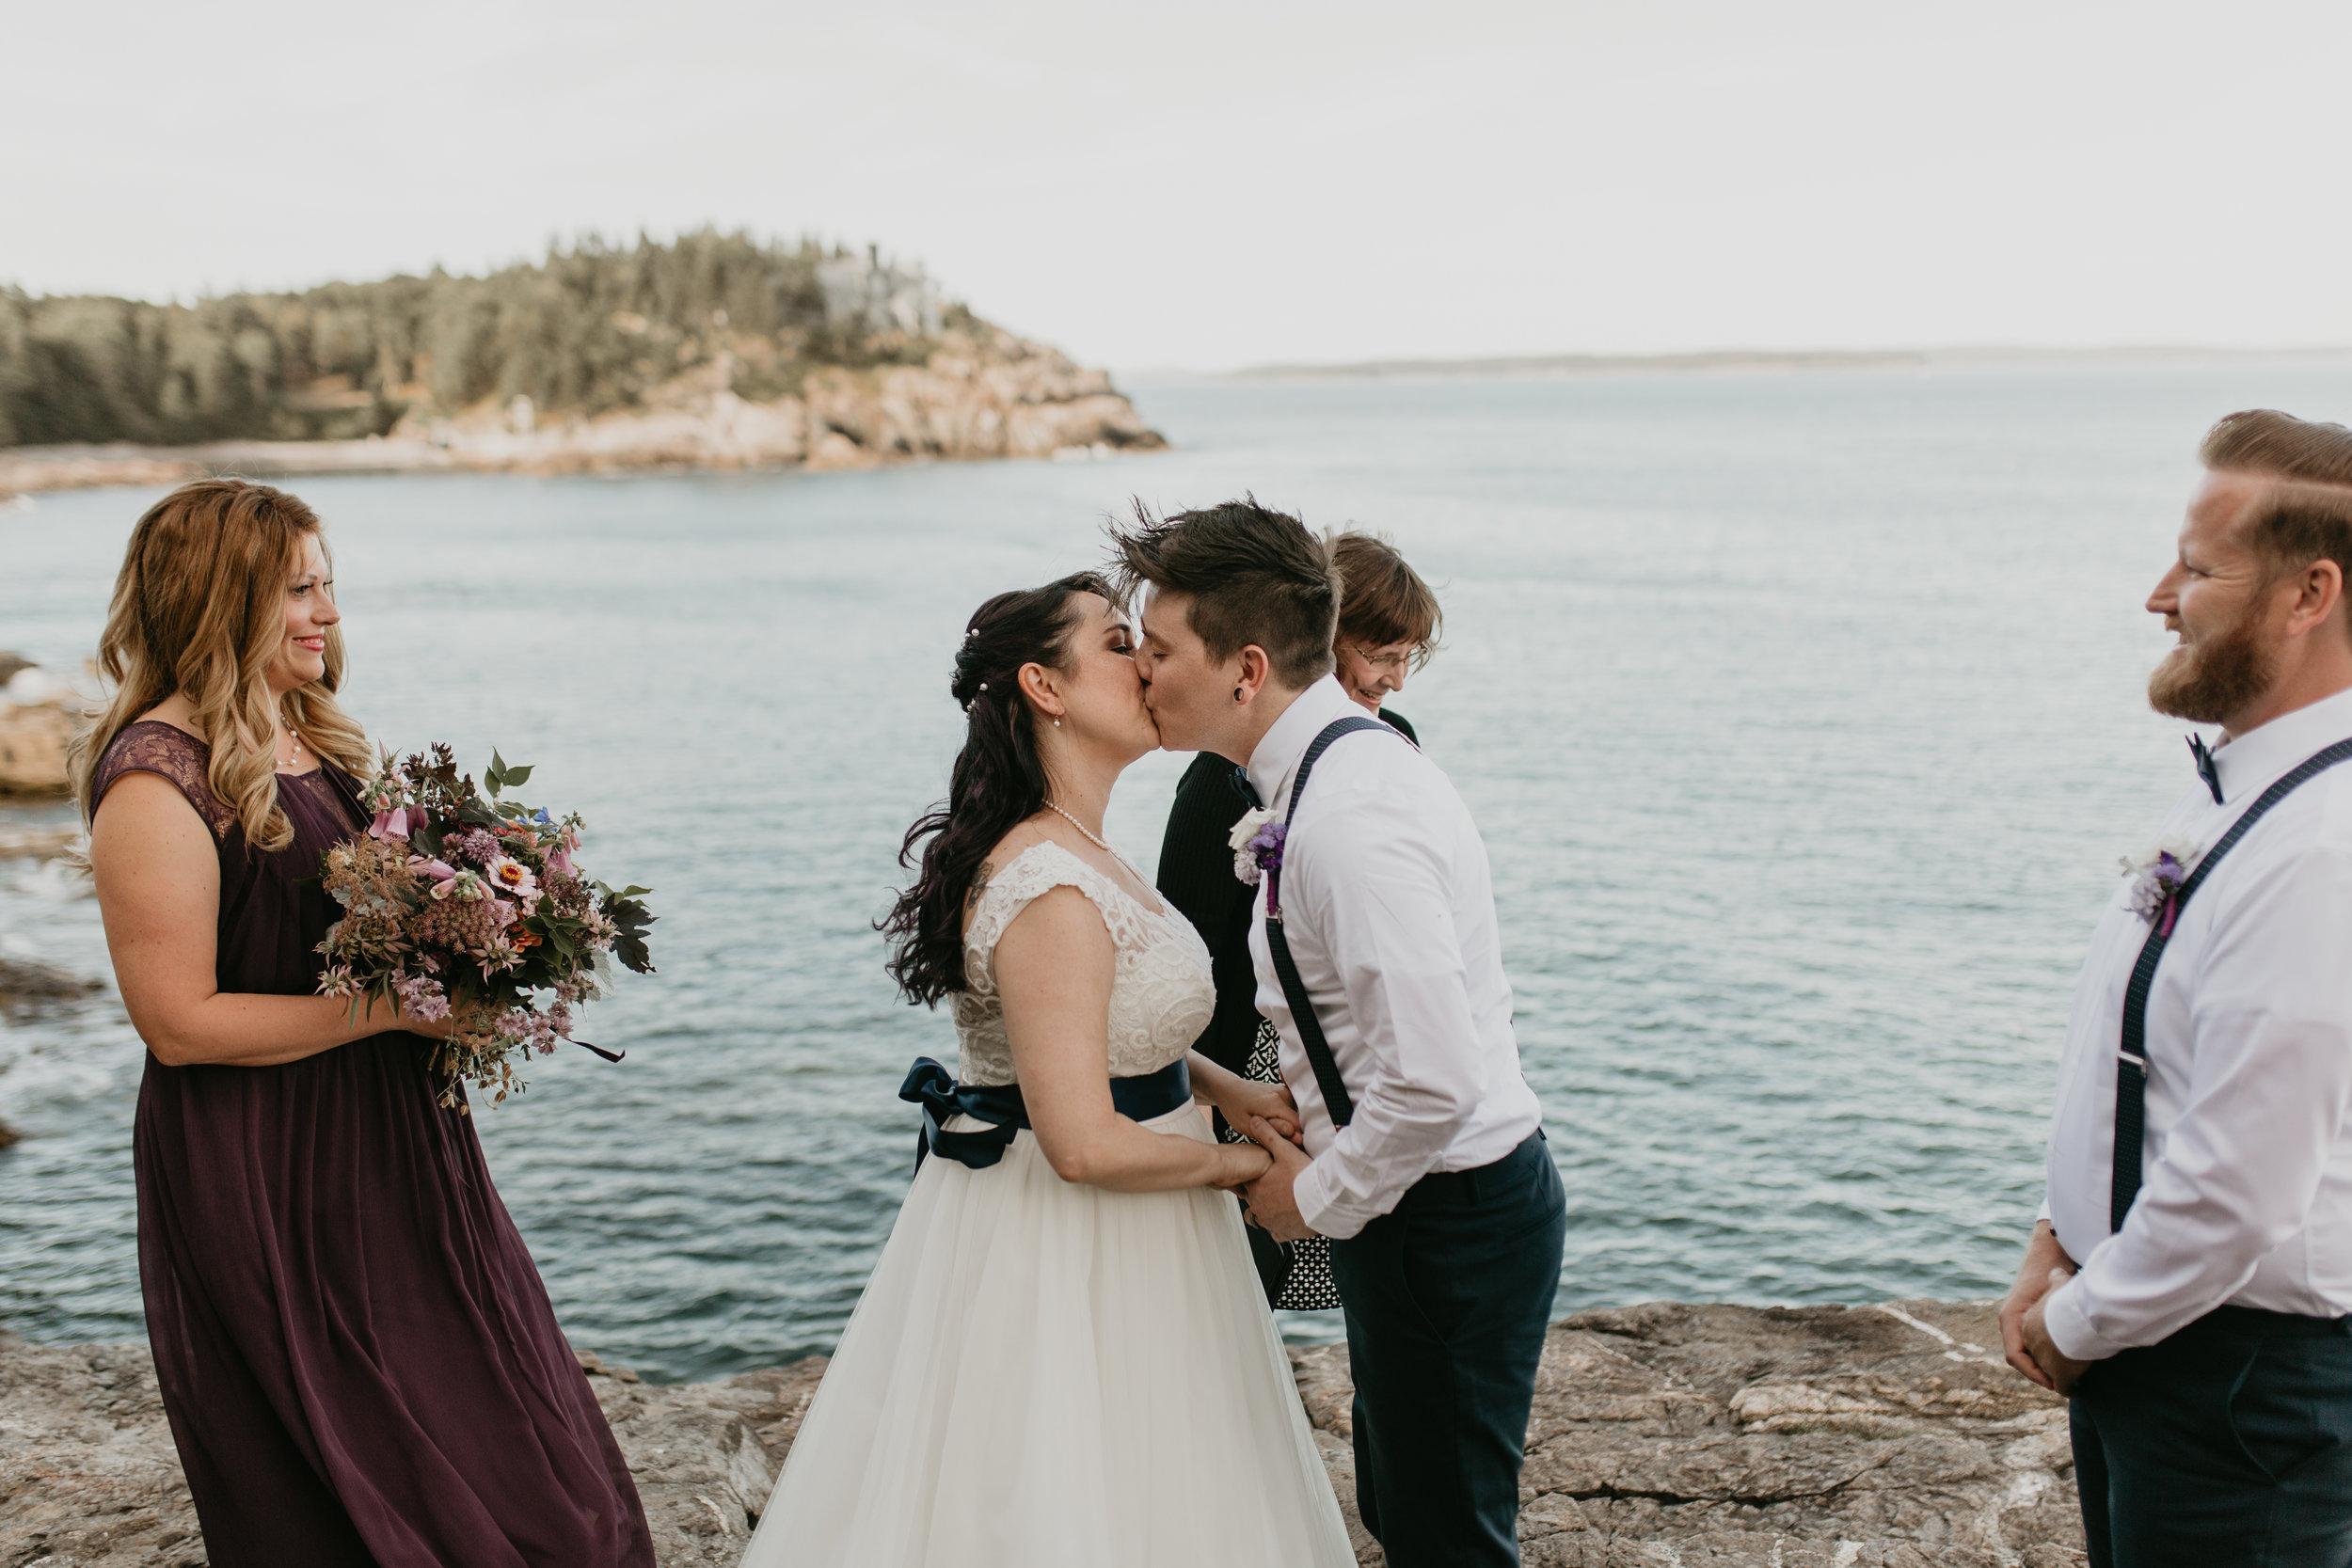 nicole-daacke-photography-Elopement-rocky-shoreline-coast-Acadia-National-Park-elopement-photographer-inspiration-maine-elopement-otter-cliffs-schoonic-head-point-25.jpg